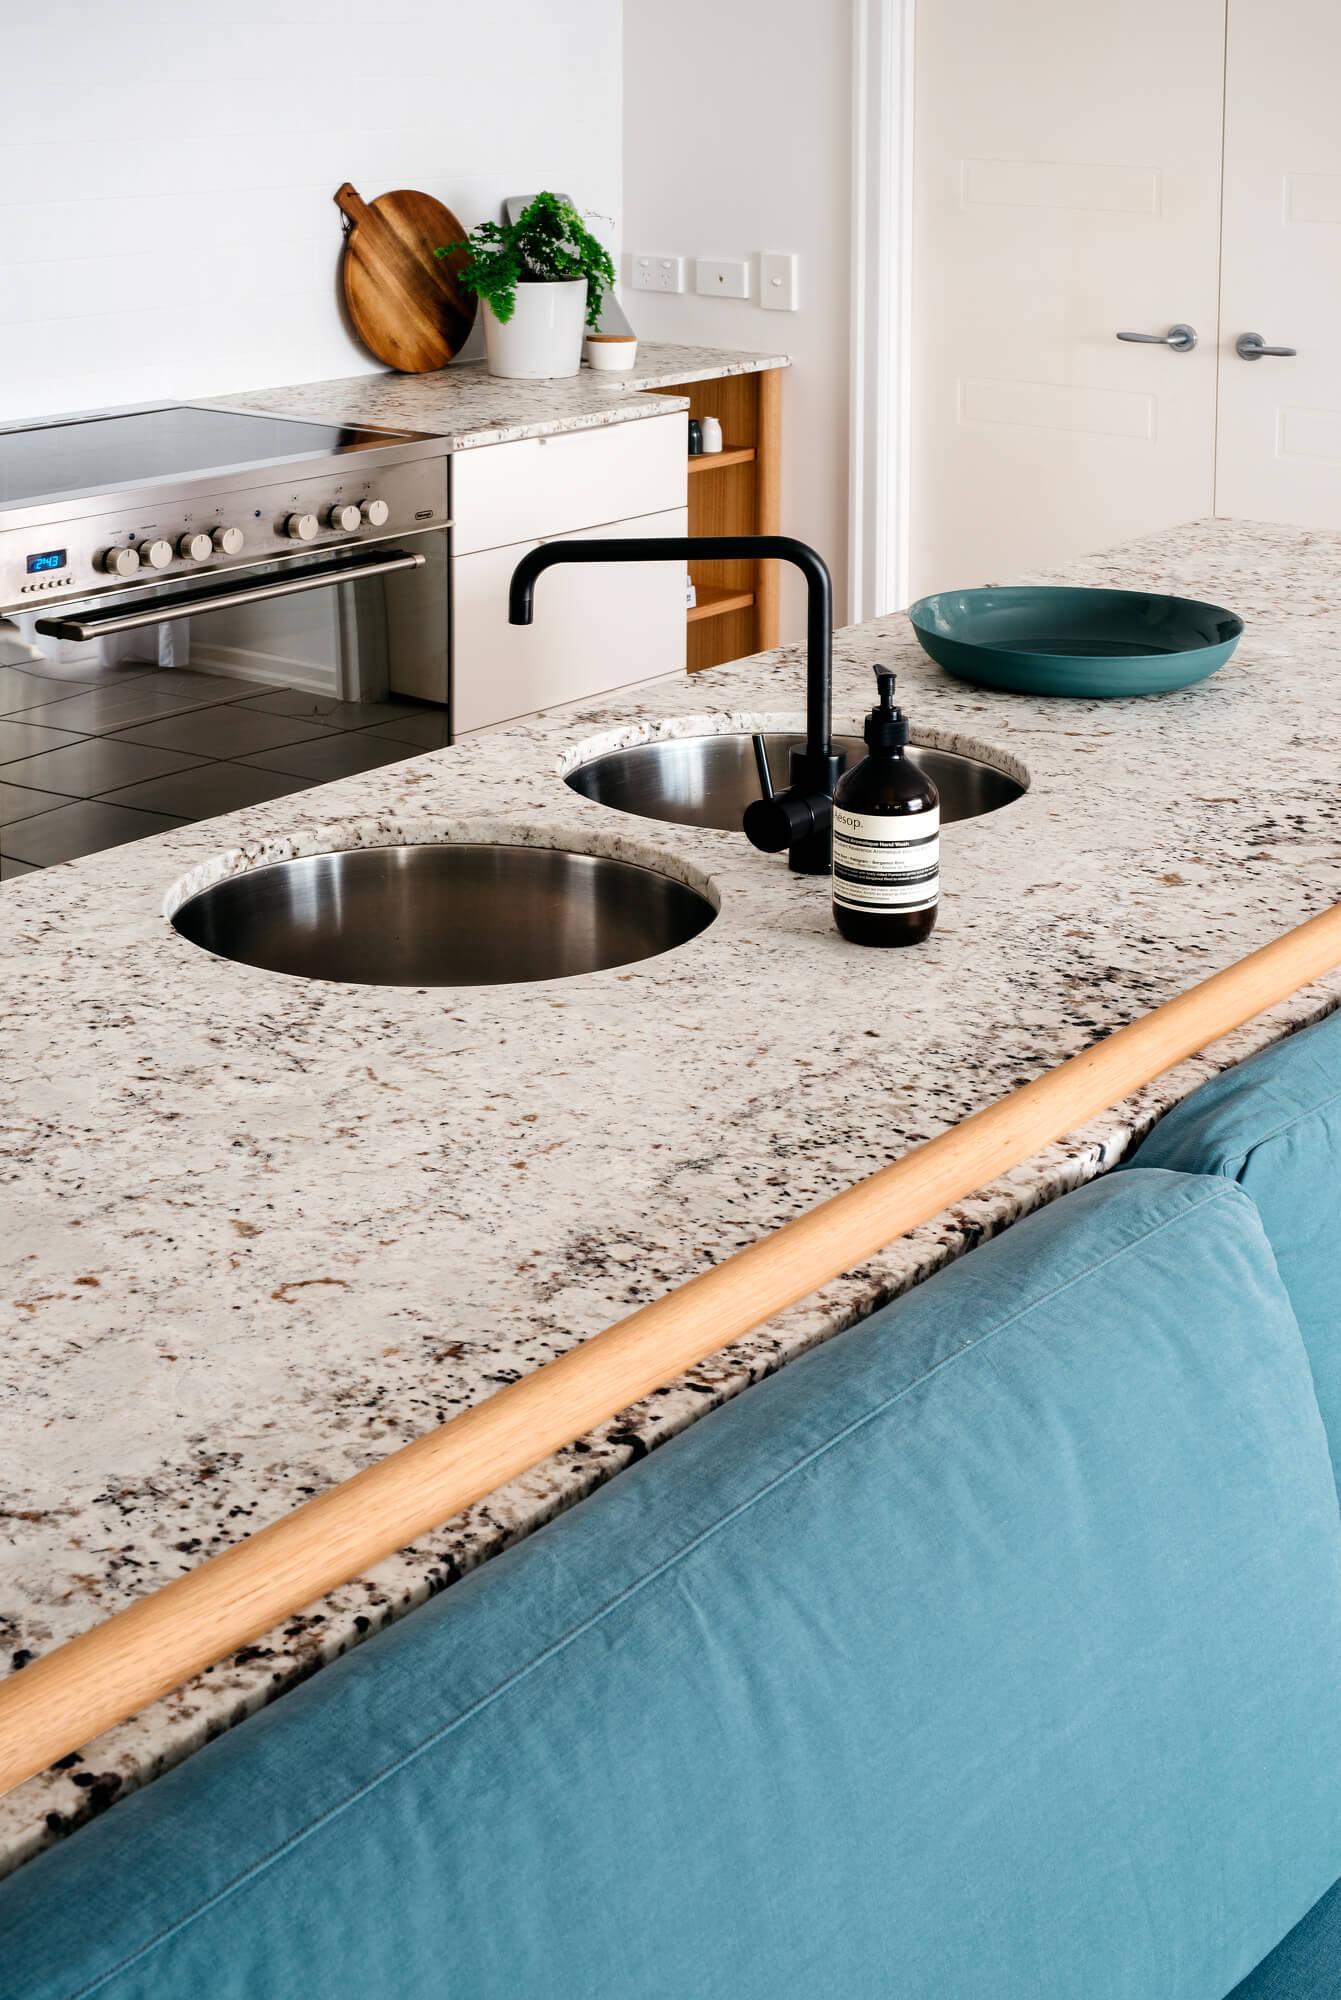 georgia-cannon-interior-designer-brisbane-project-r1-kitchen-7013.jpg